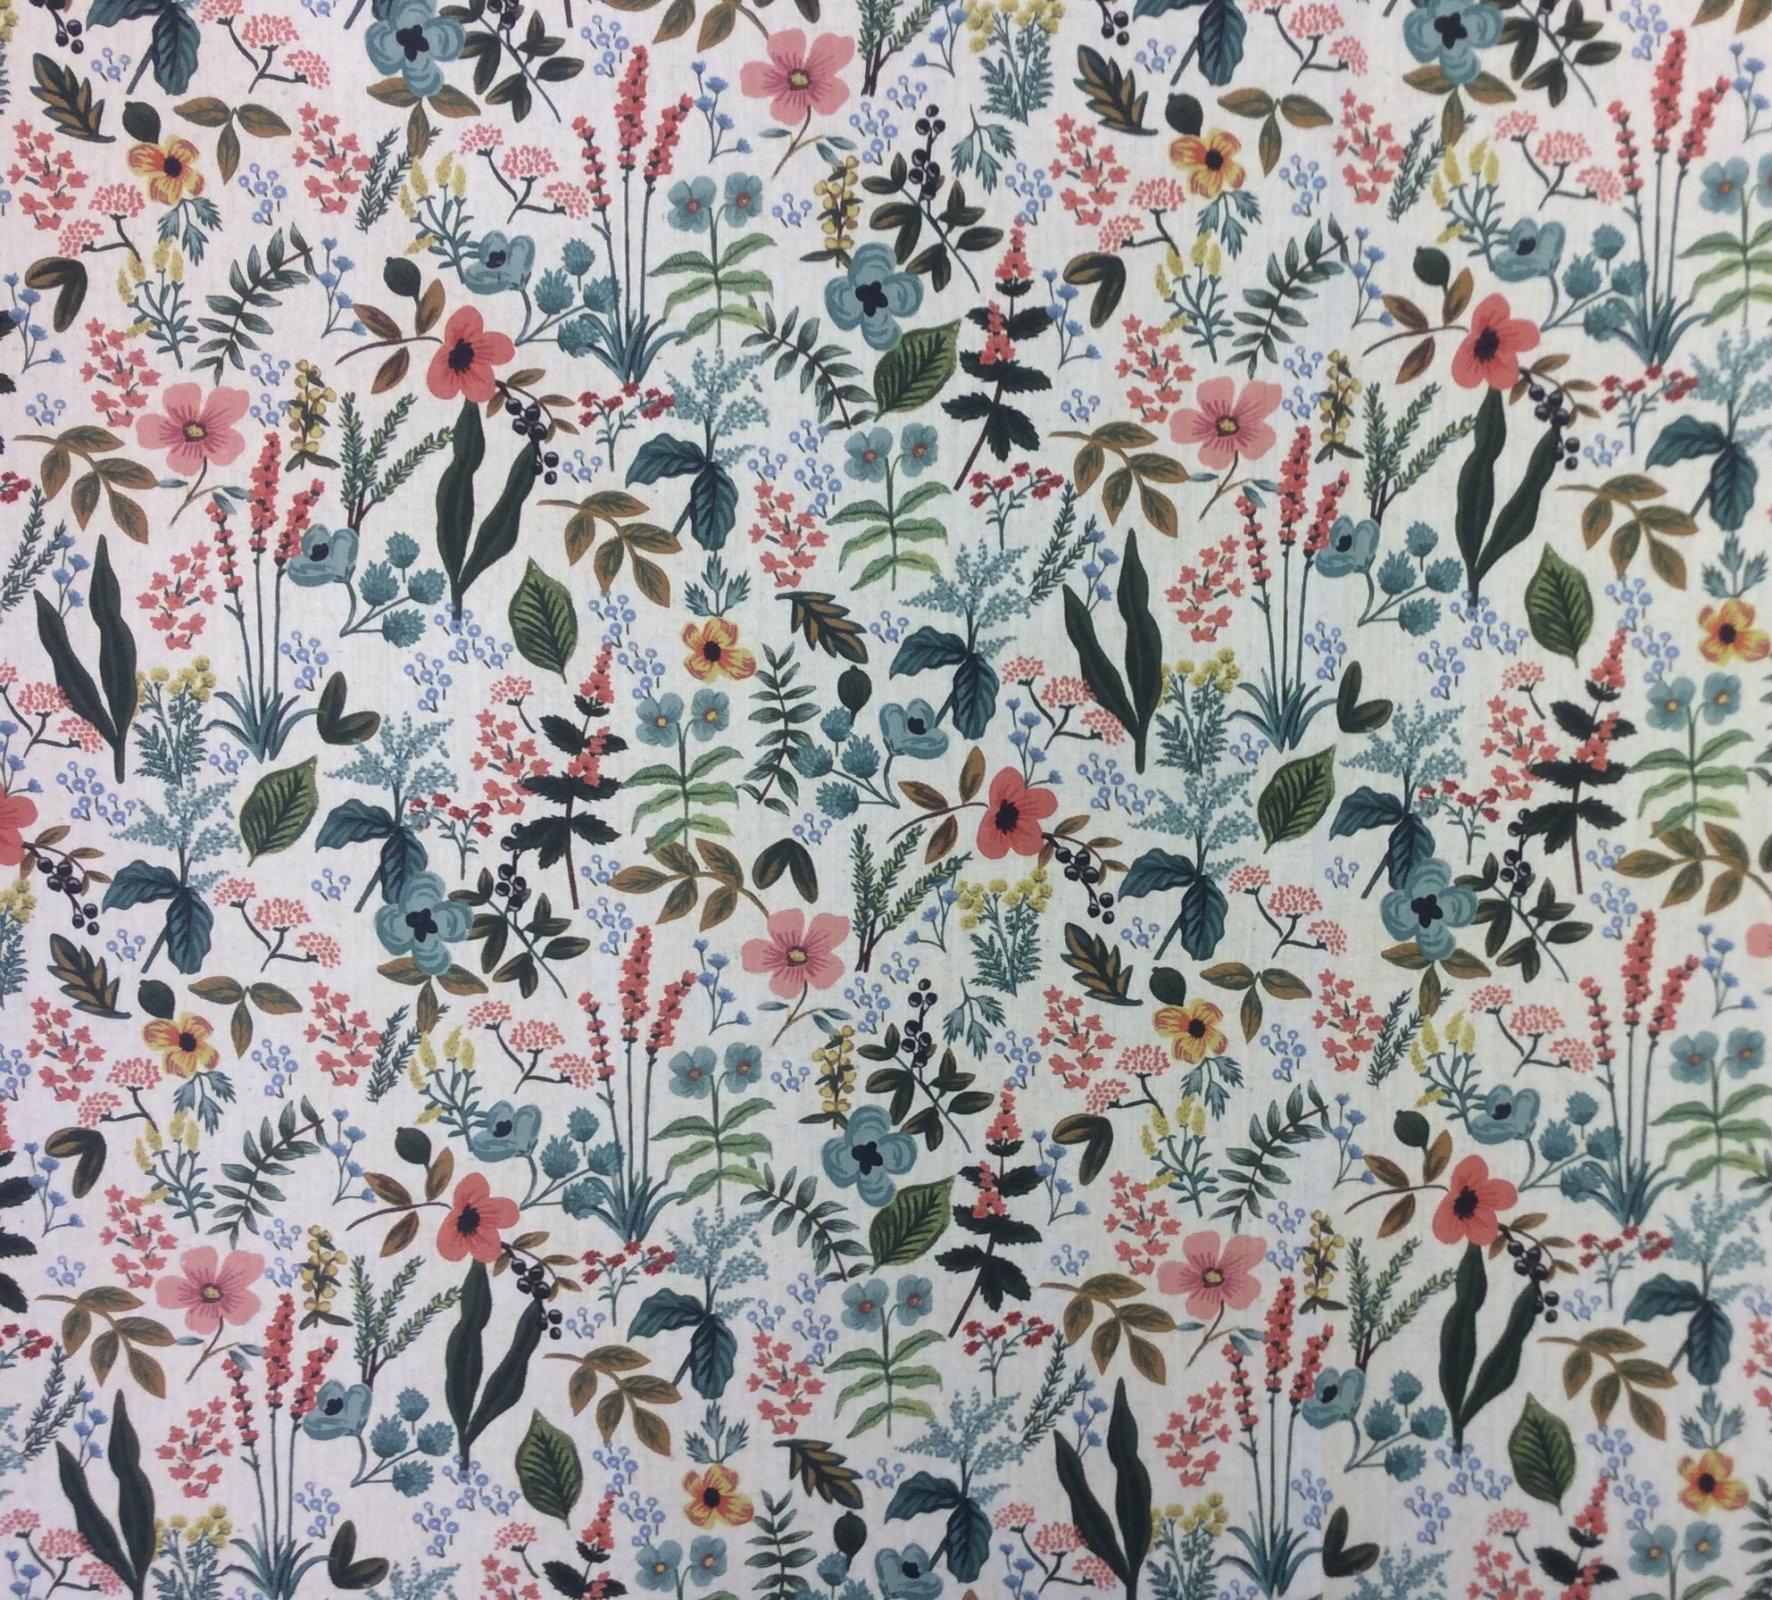 CTN92. Rifle Paper Company Herb Garden Natural Canvas Cotton Linen Fabric